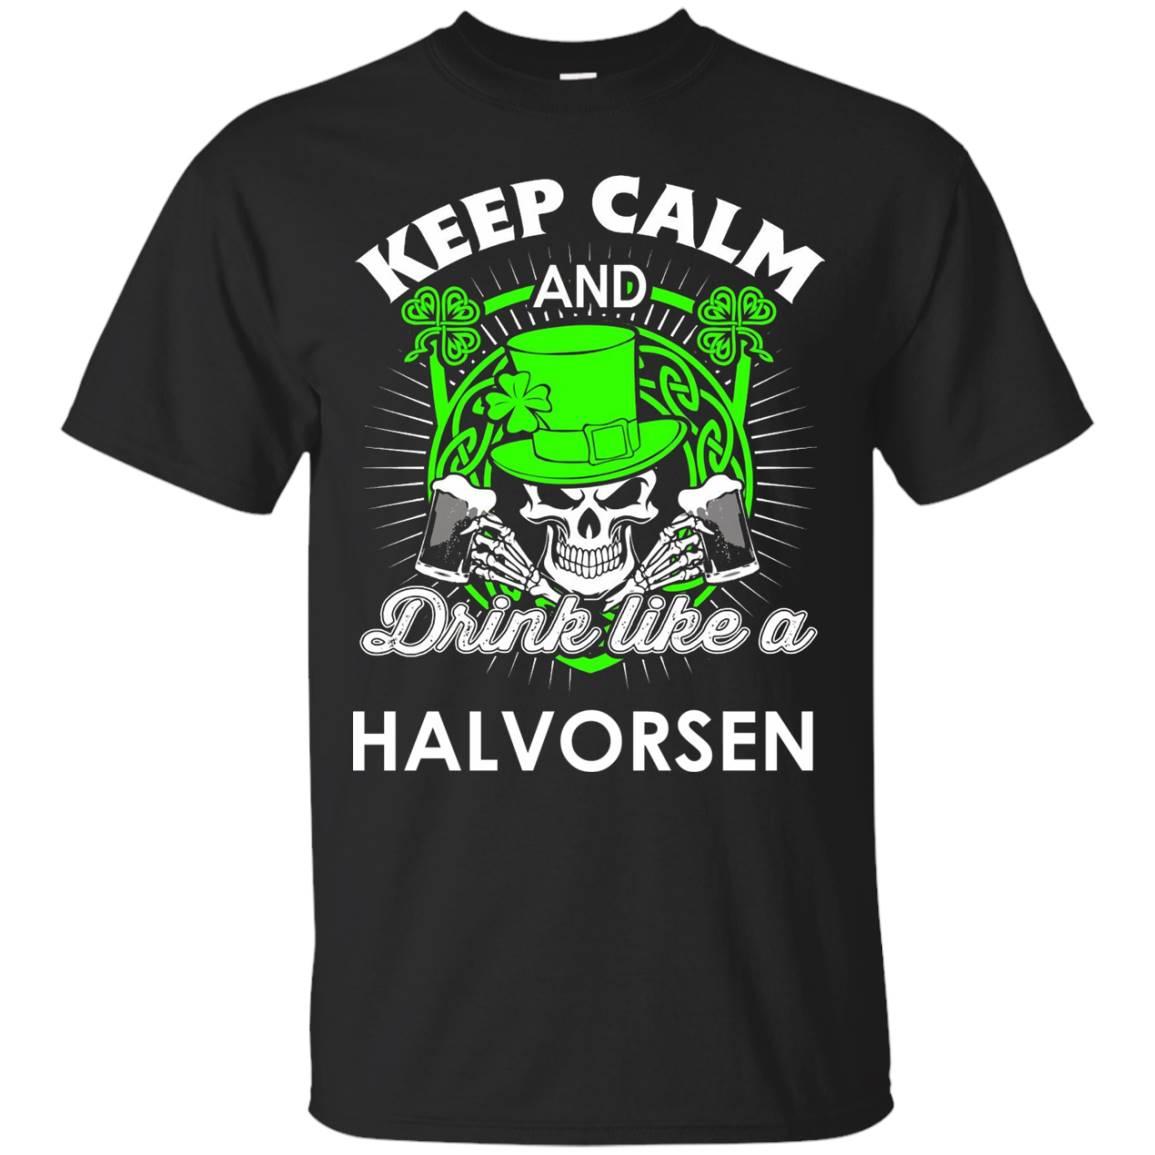 Keep calm and drink like a Halvorsen